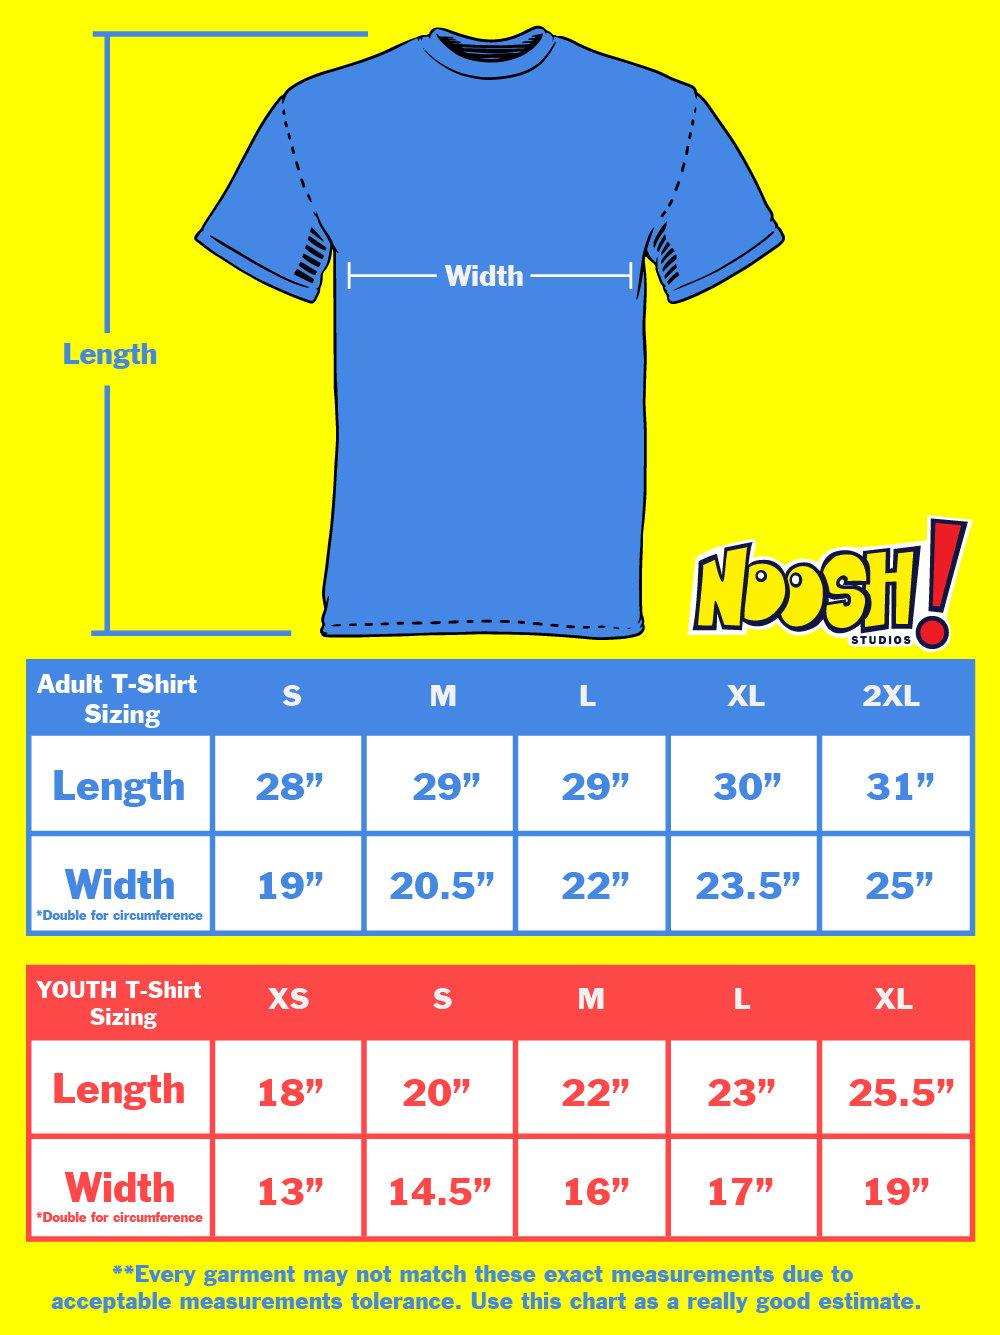 Happy little corgi T-shirt (A1) **FREE SHIPPING**